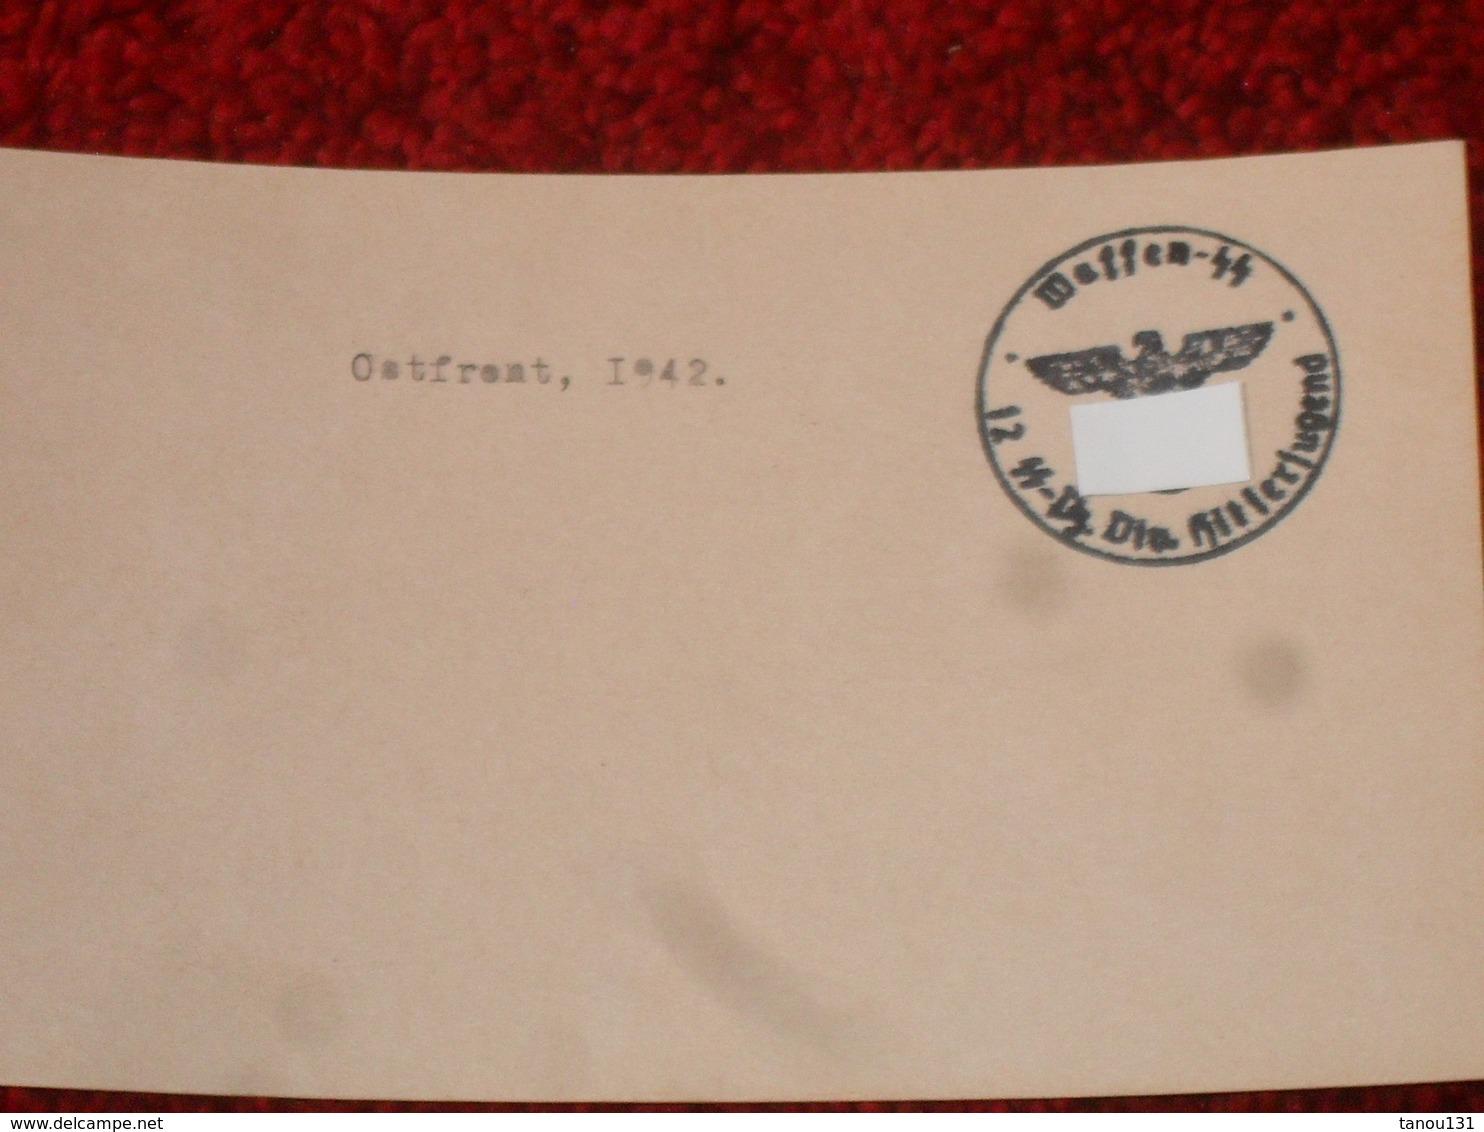 WW2. ALLEMAGNE. PHOTOGRAPHIE AUTOCHENILLE. OSTFRONT 1942 - Documenti